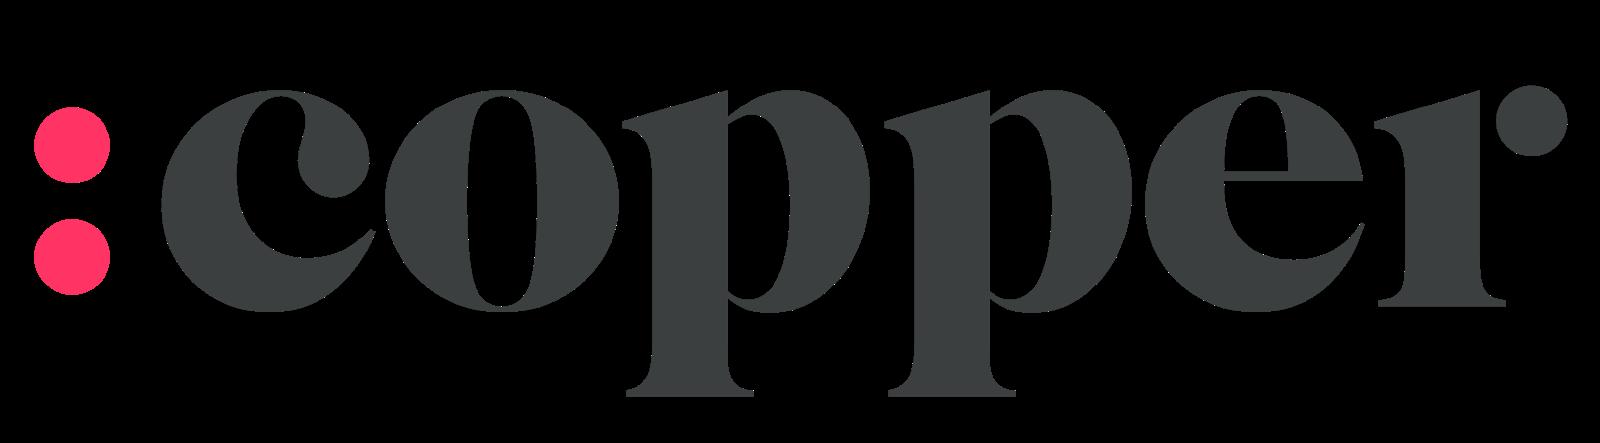 Copper crm Logo